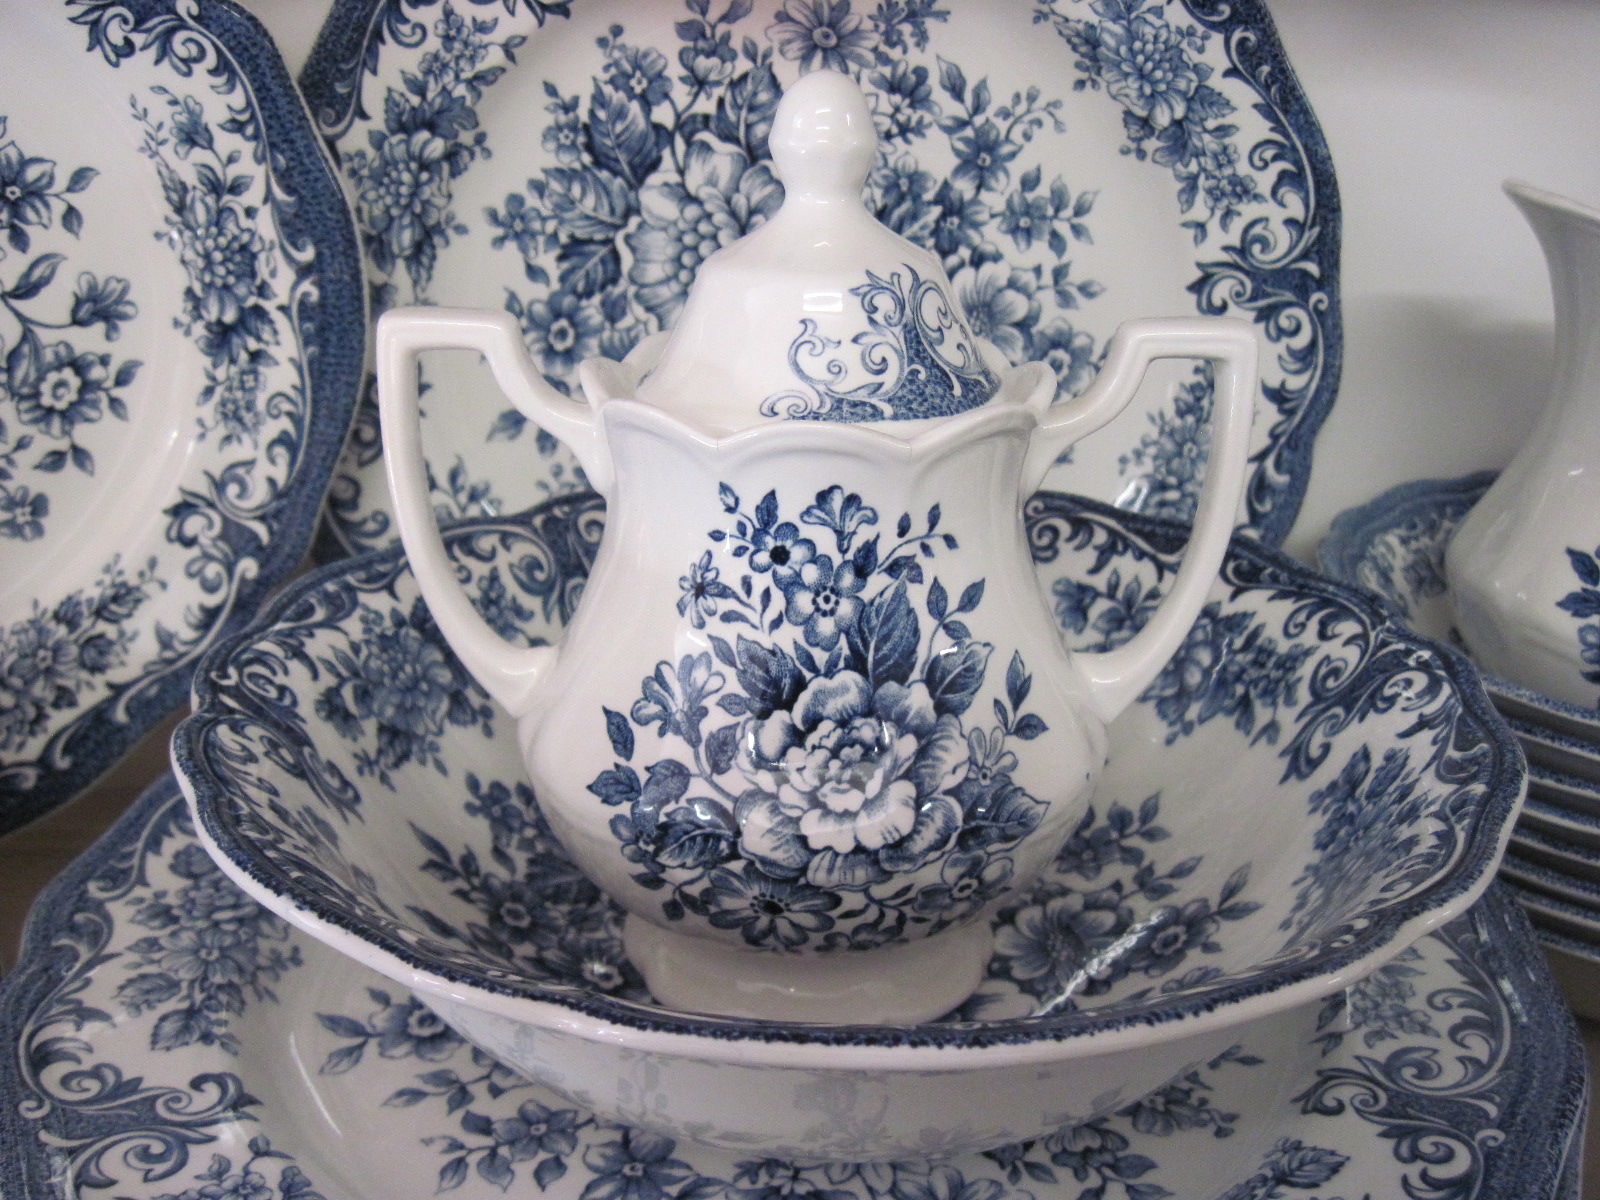 IMG_8986 & J \u0026 G Meakin Avondale Royal Staffordshire Dishes | fabfindsblog